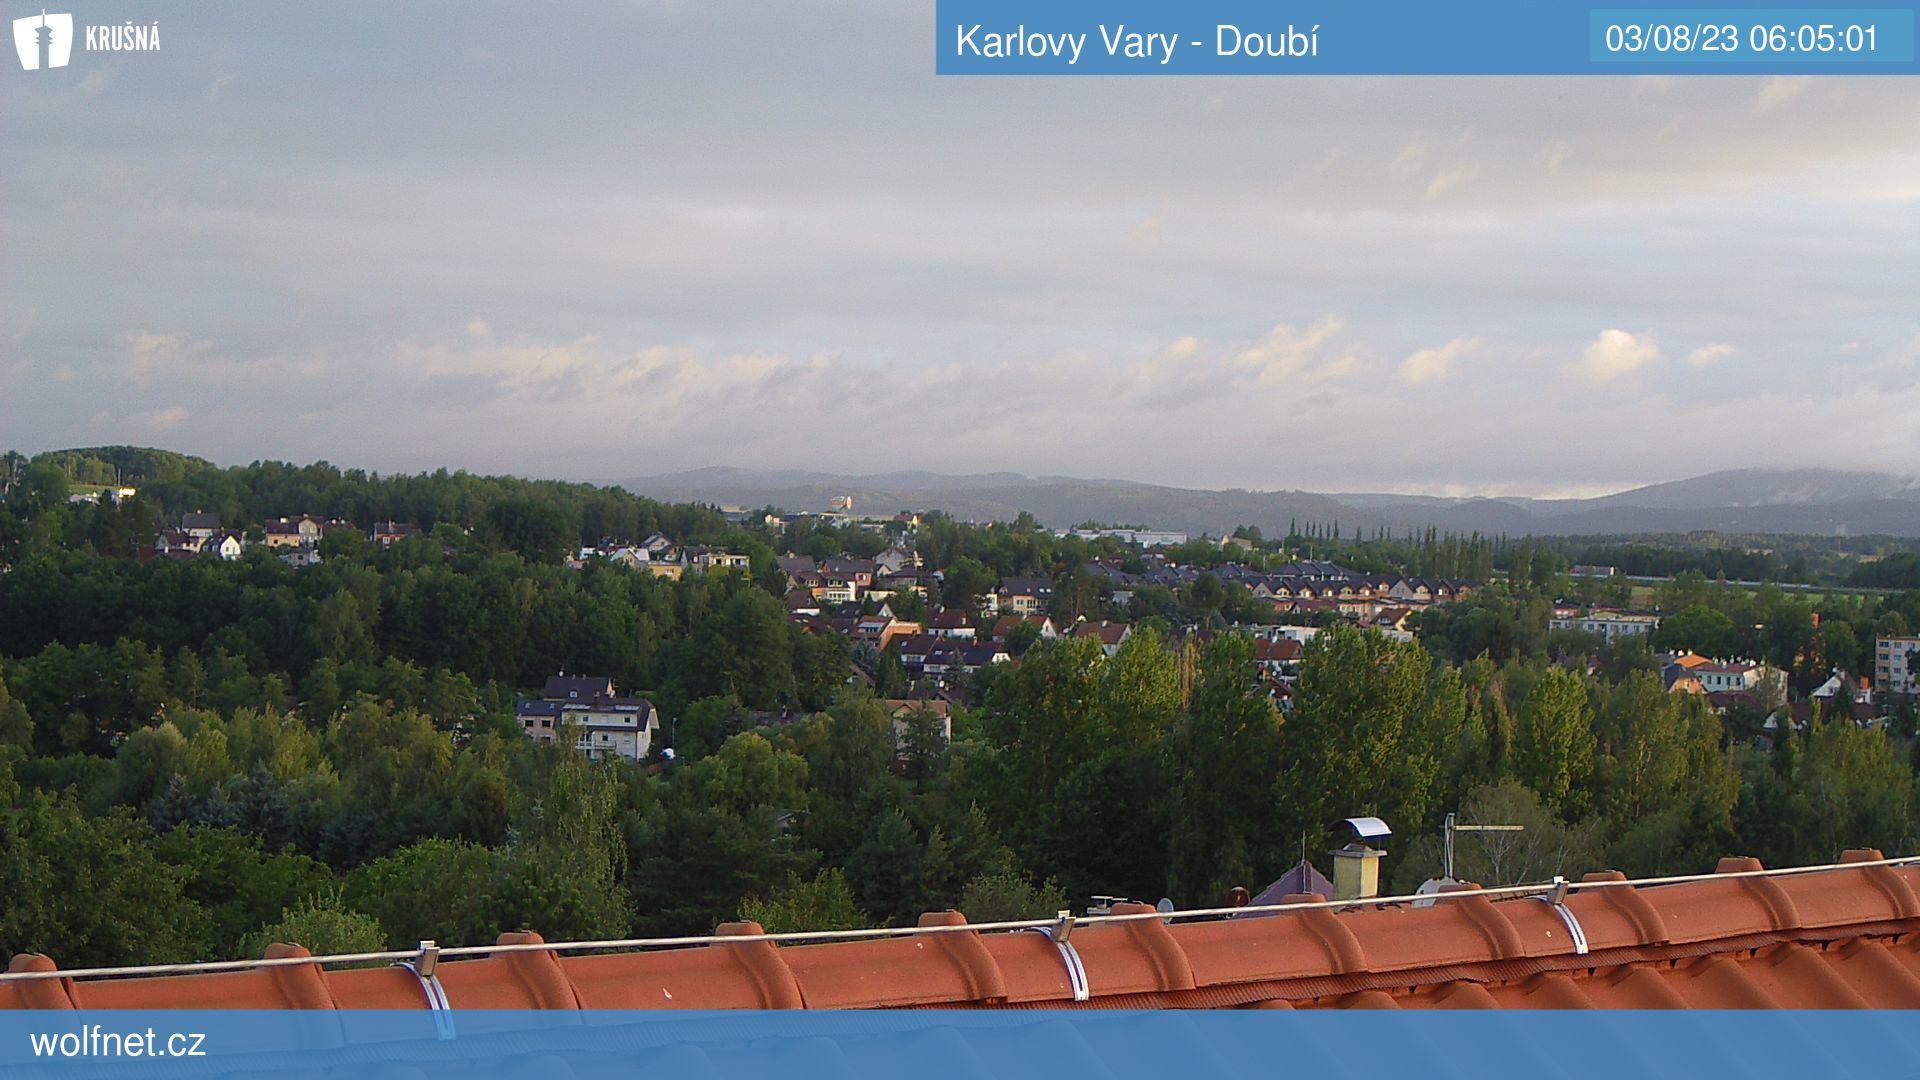 Webkamera Karlovy Vary - Doubí